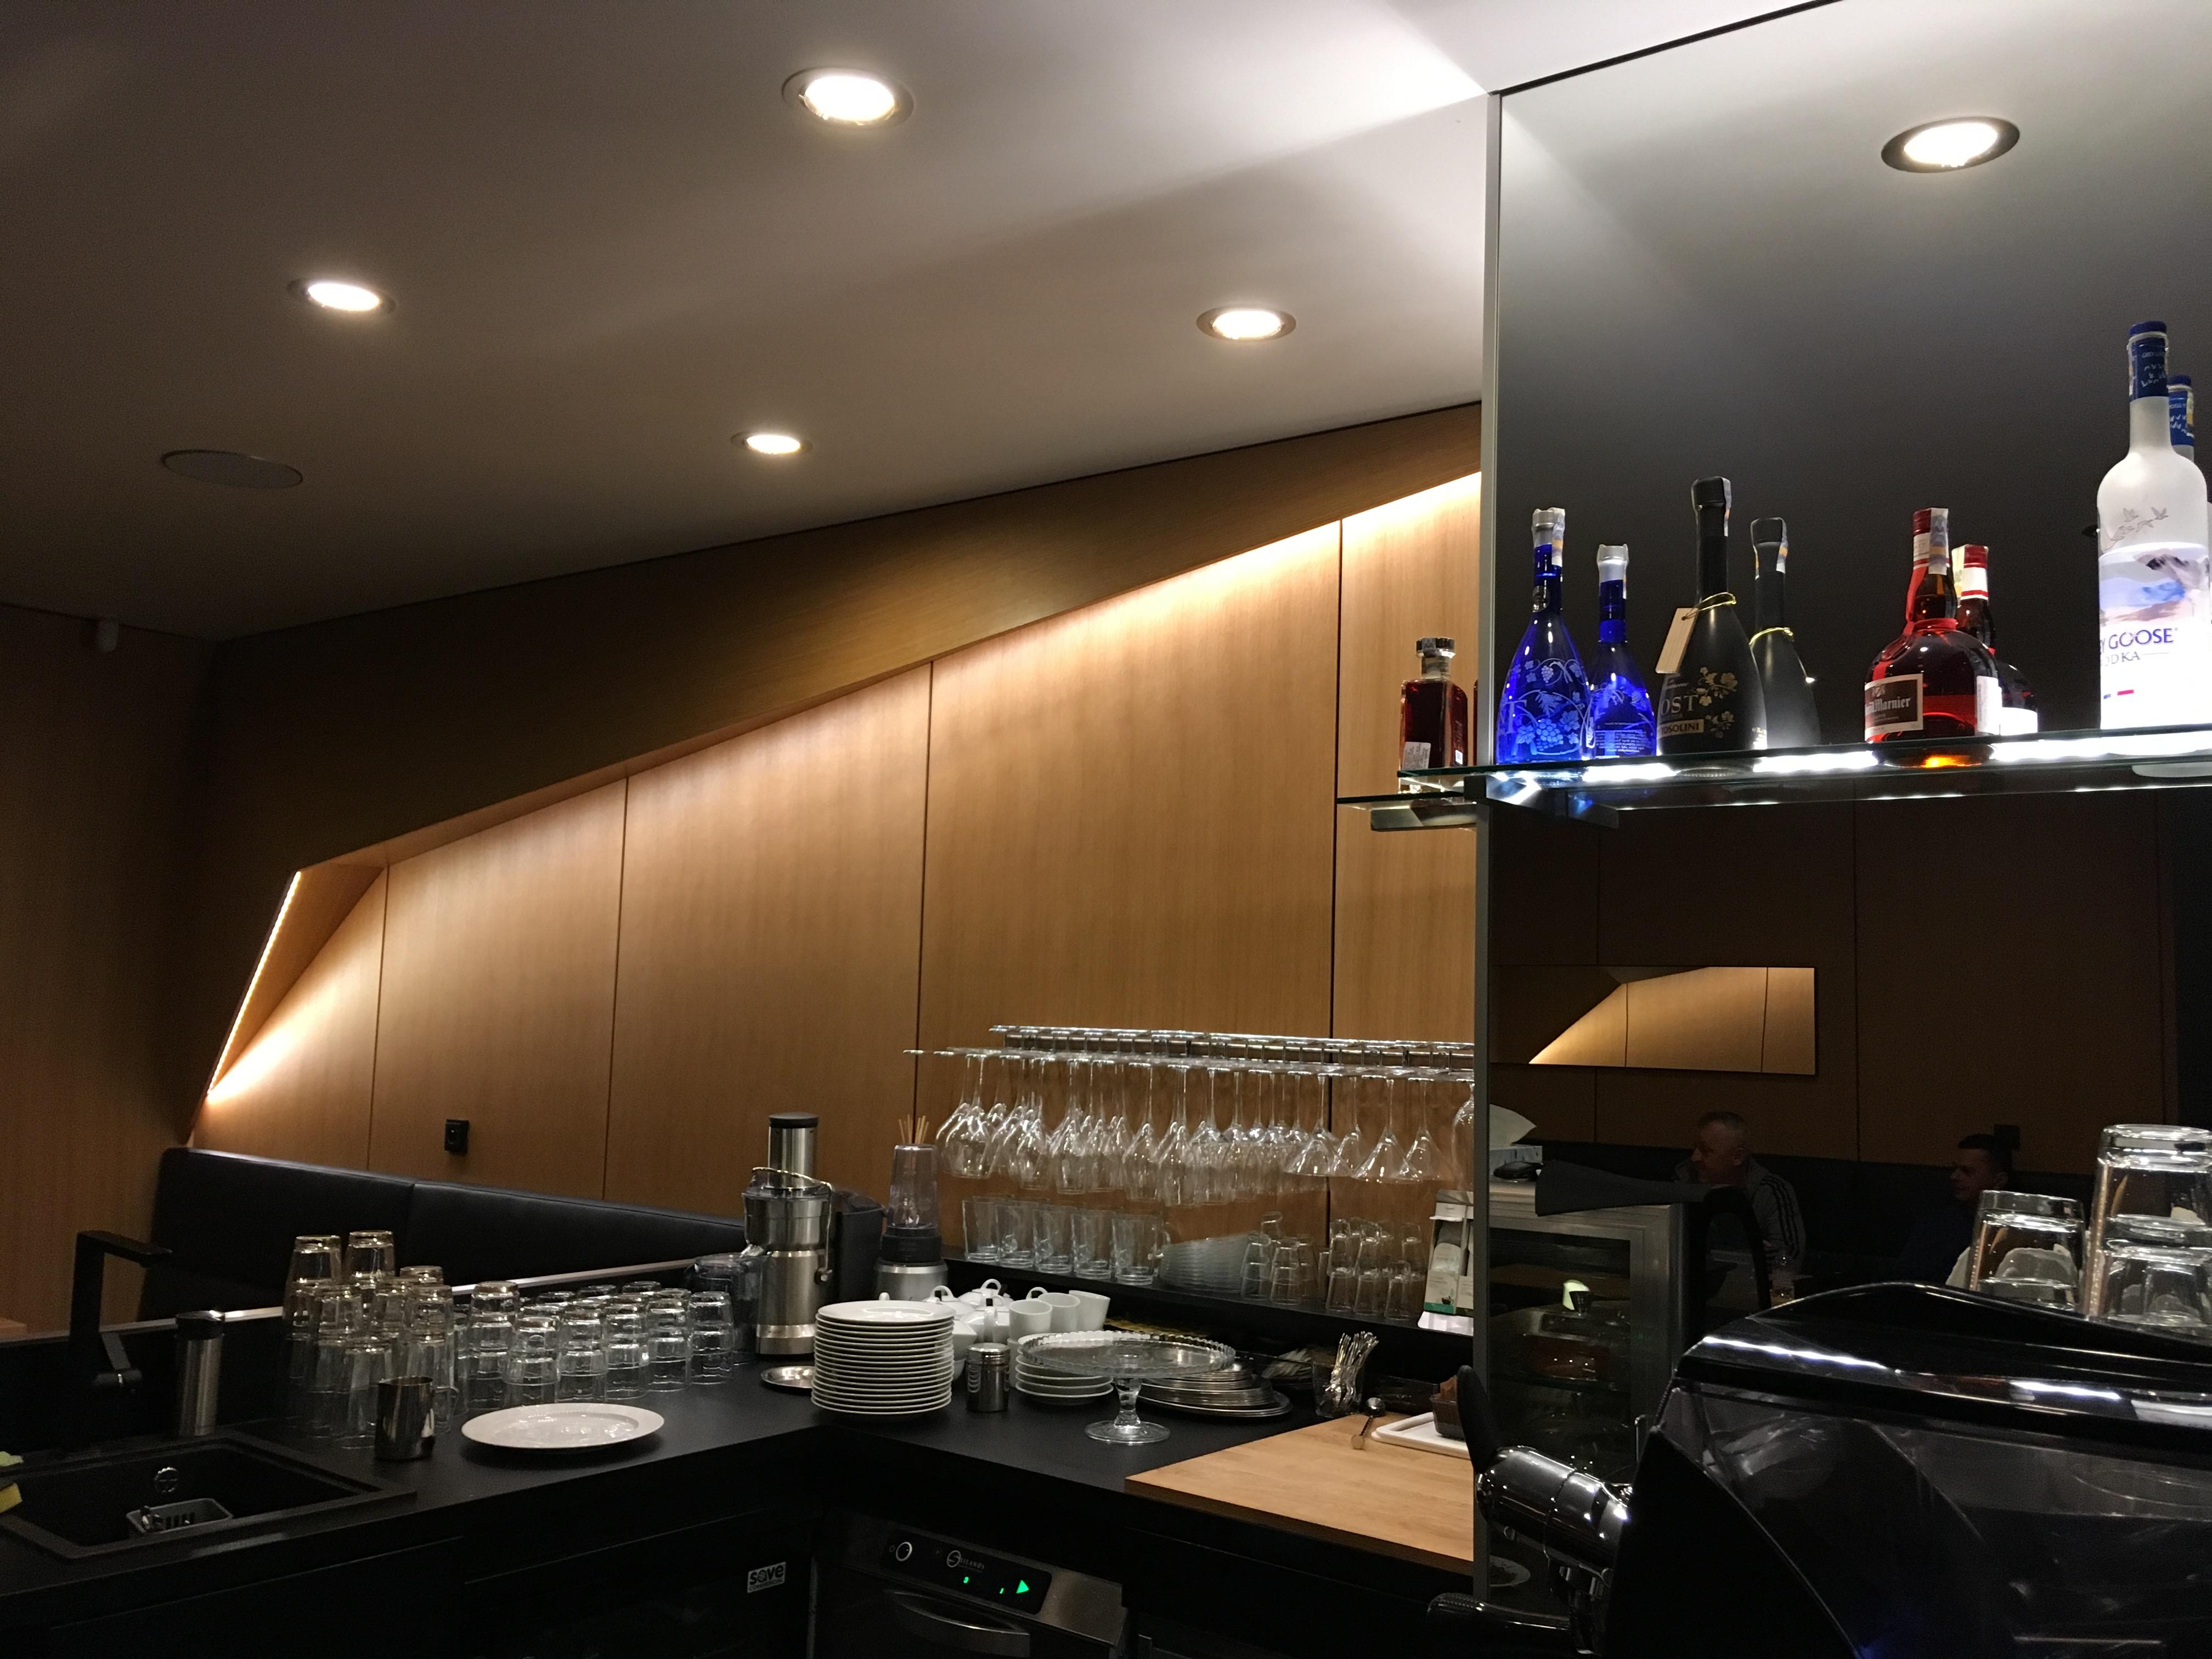 001 PAUS CAFÉ.JPG